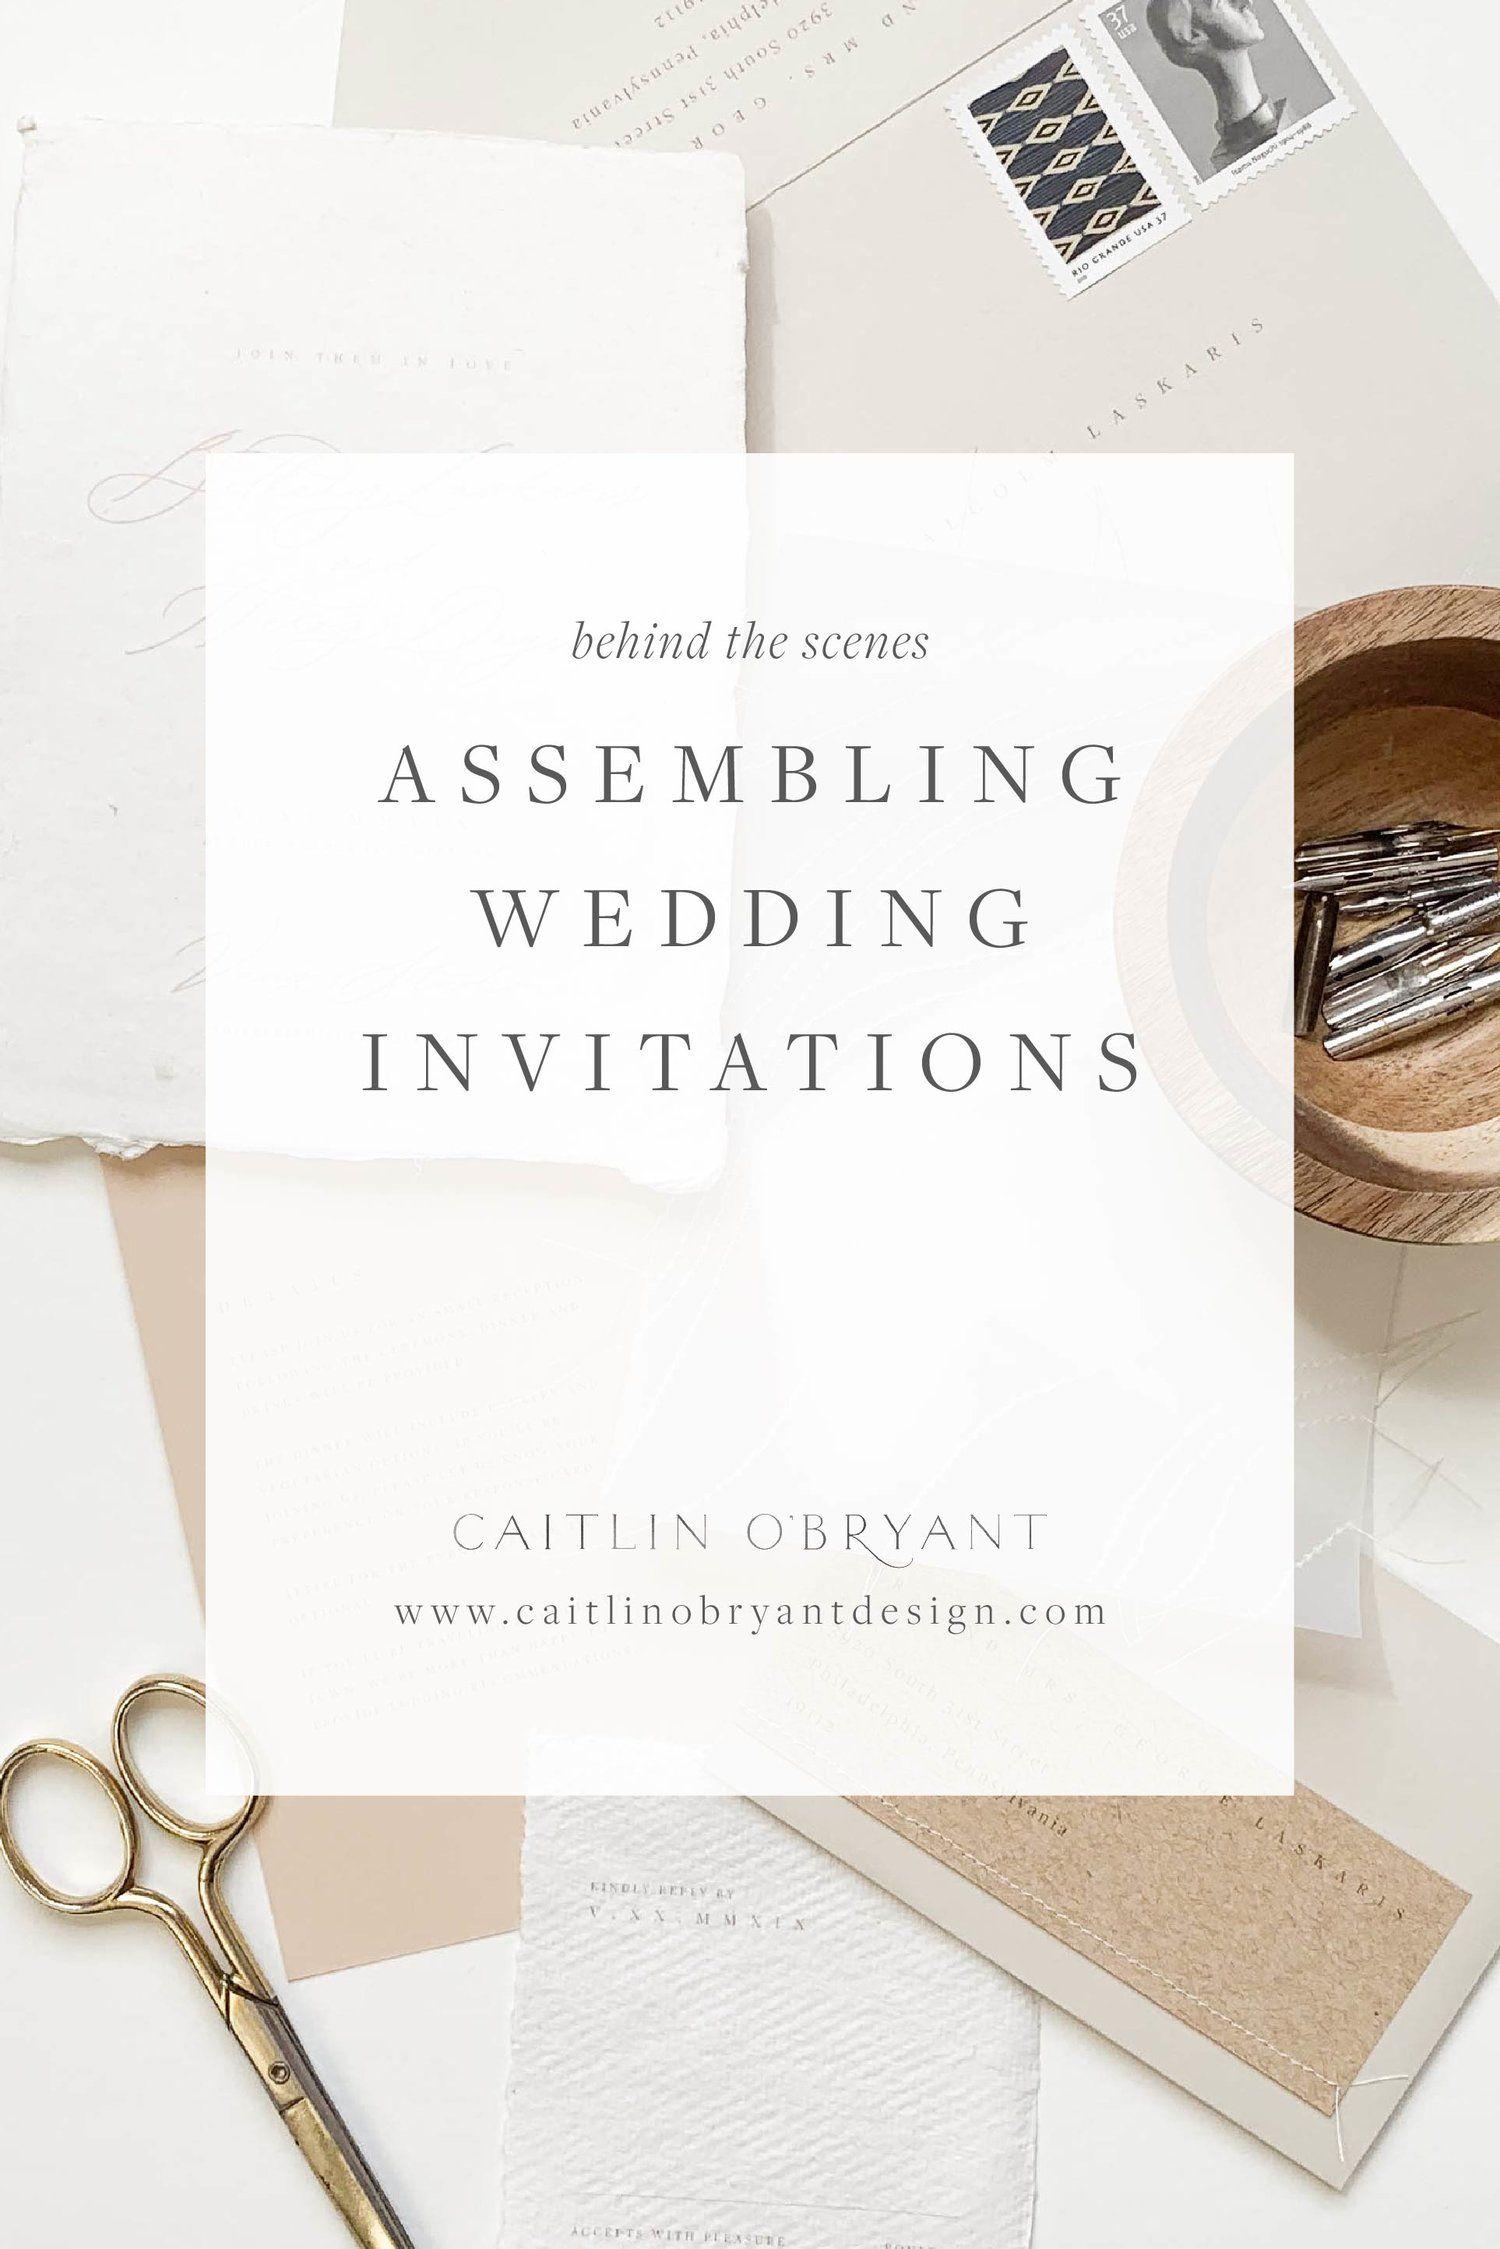 Behind The Scenes Assembling Wedding Invitations Caitlin O Bryant Design Assembling Wedding Invitations Wedding Stationery Tips Wedding Invitations